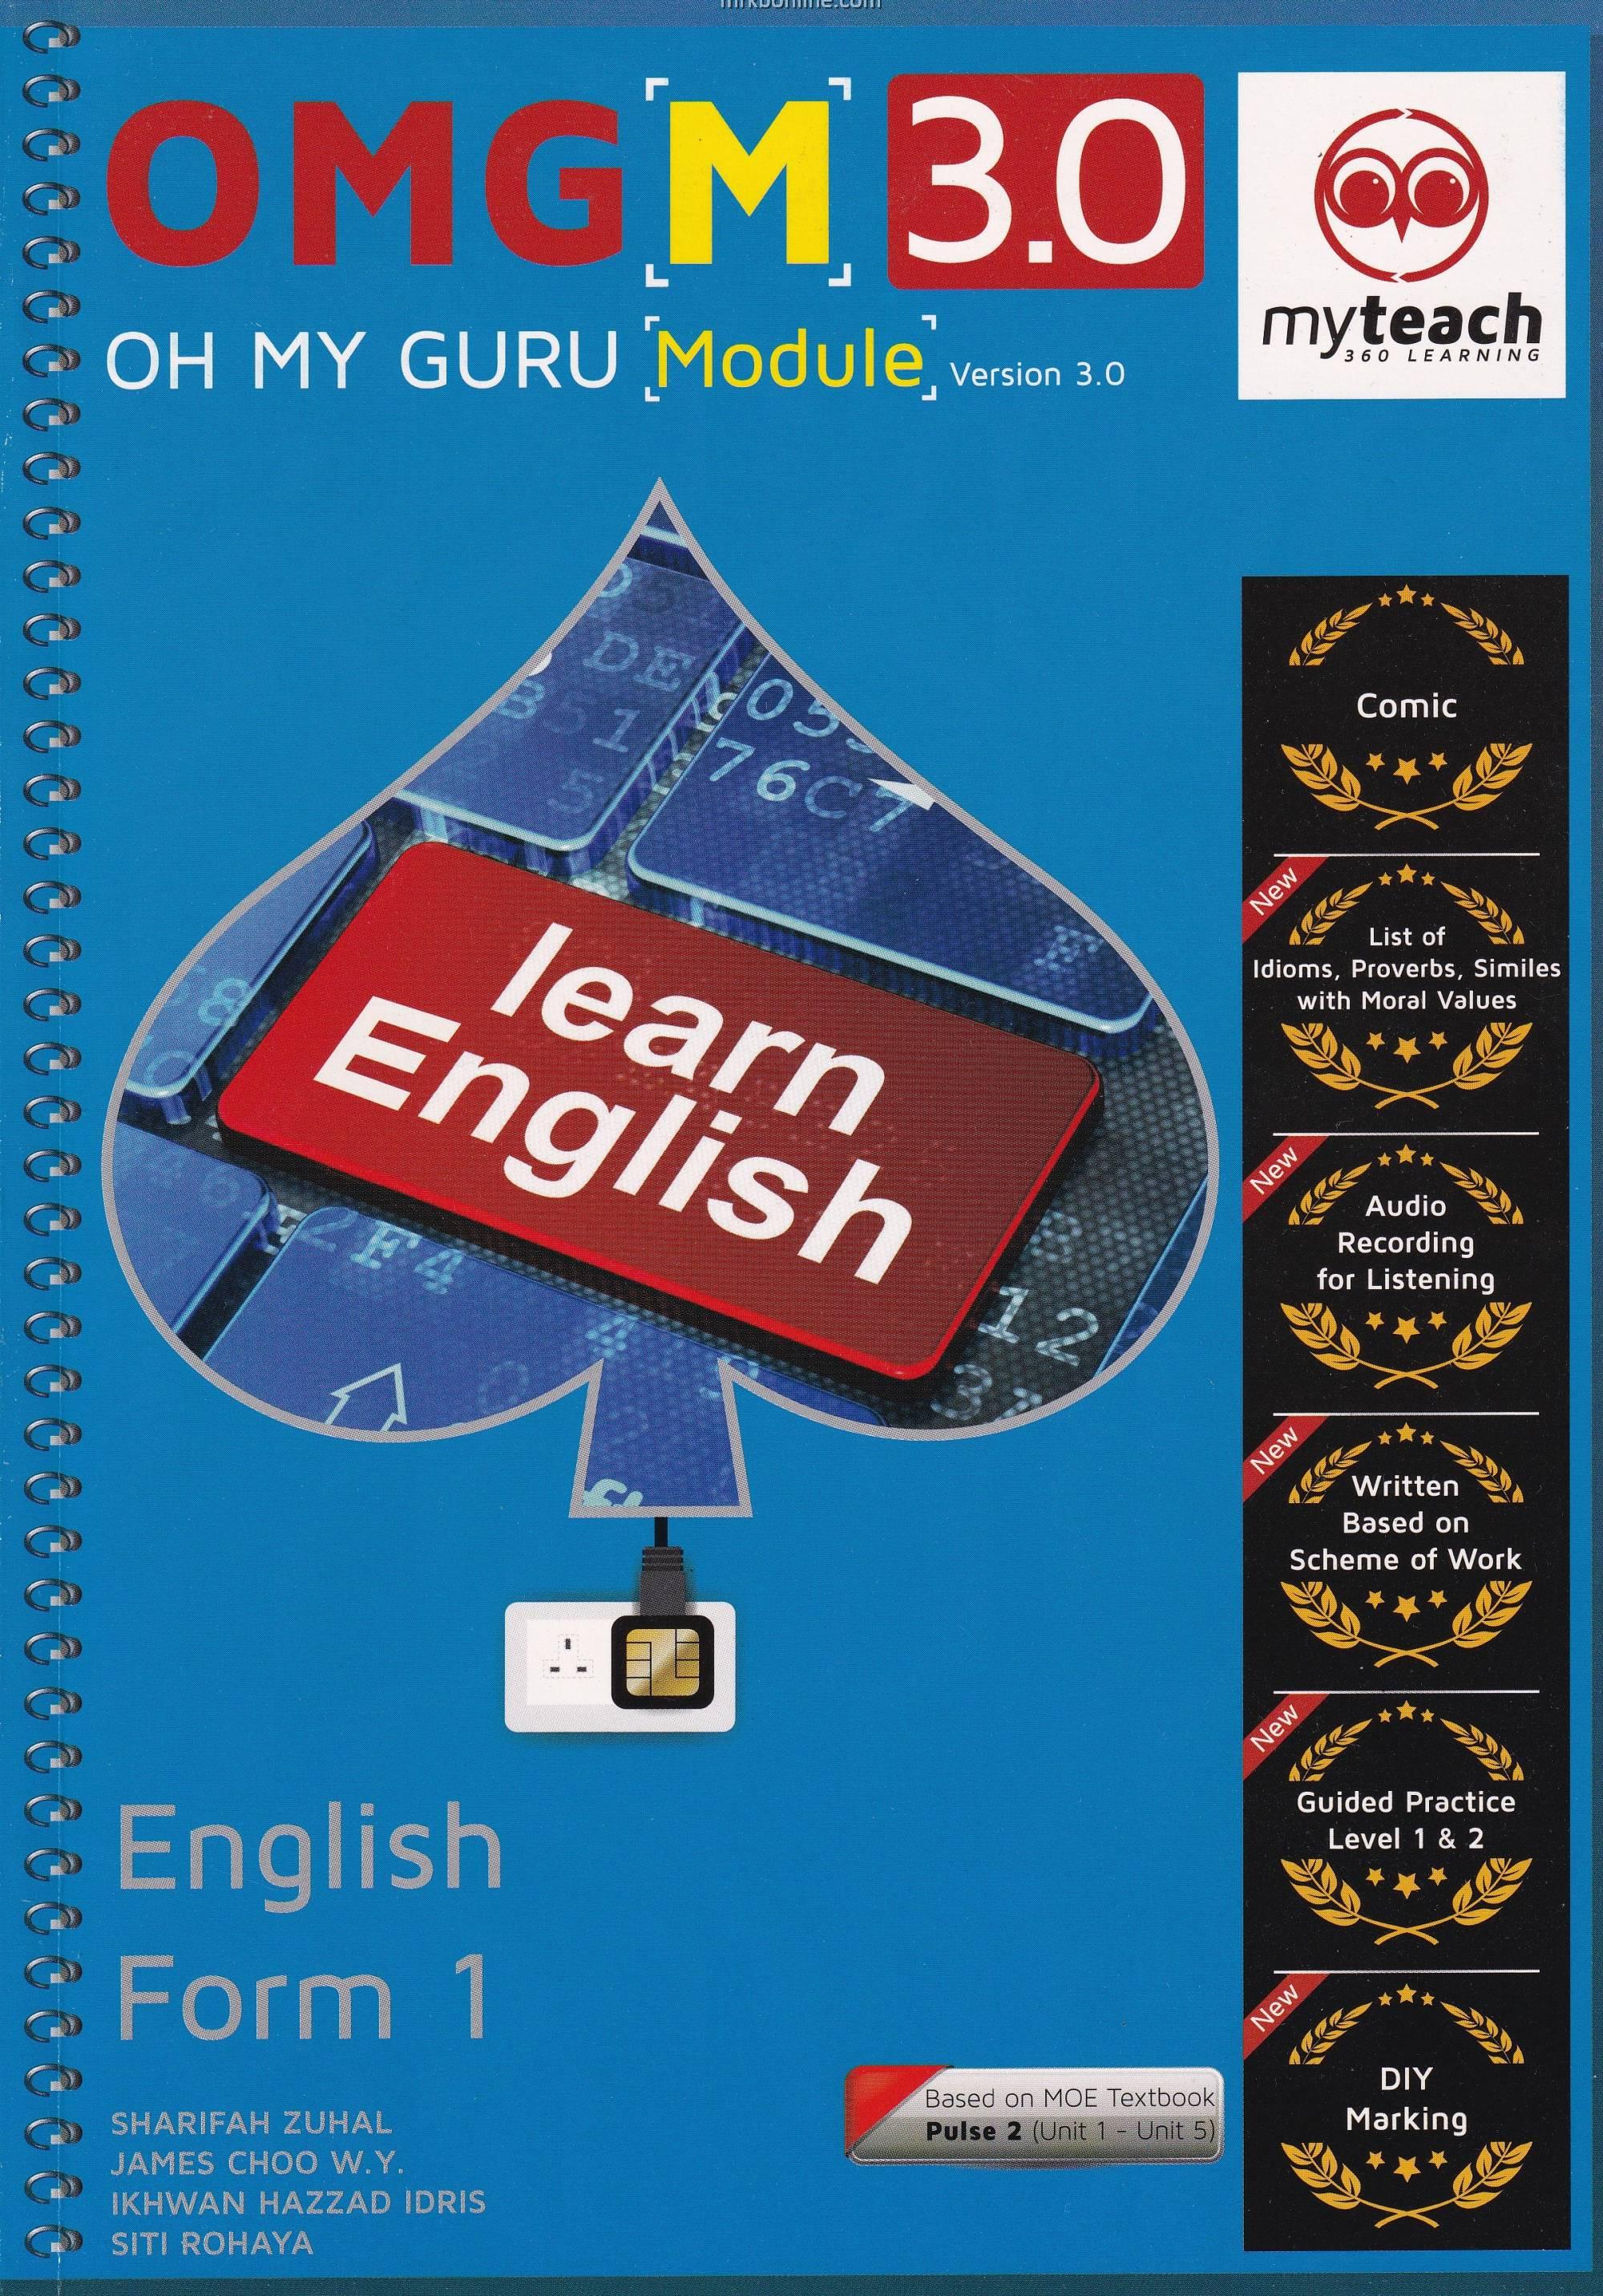 OH MY GURU [Module] Version 3 0 English Form 1